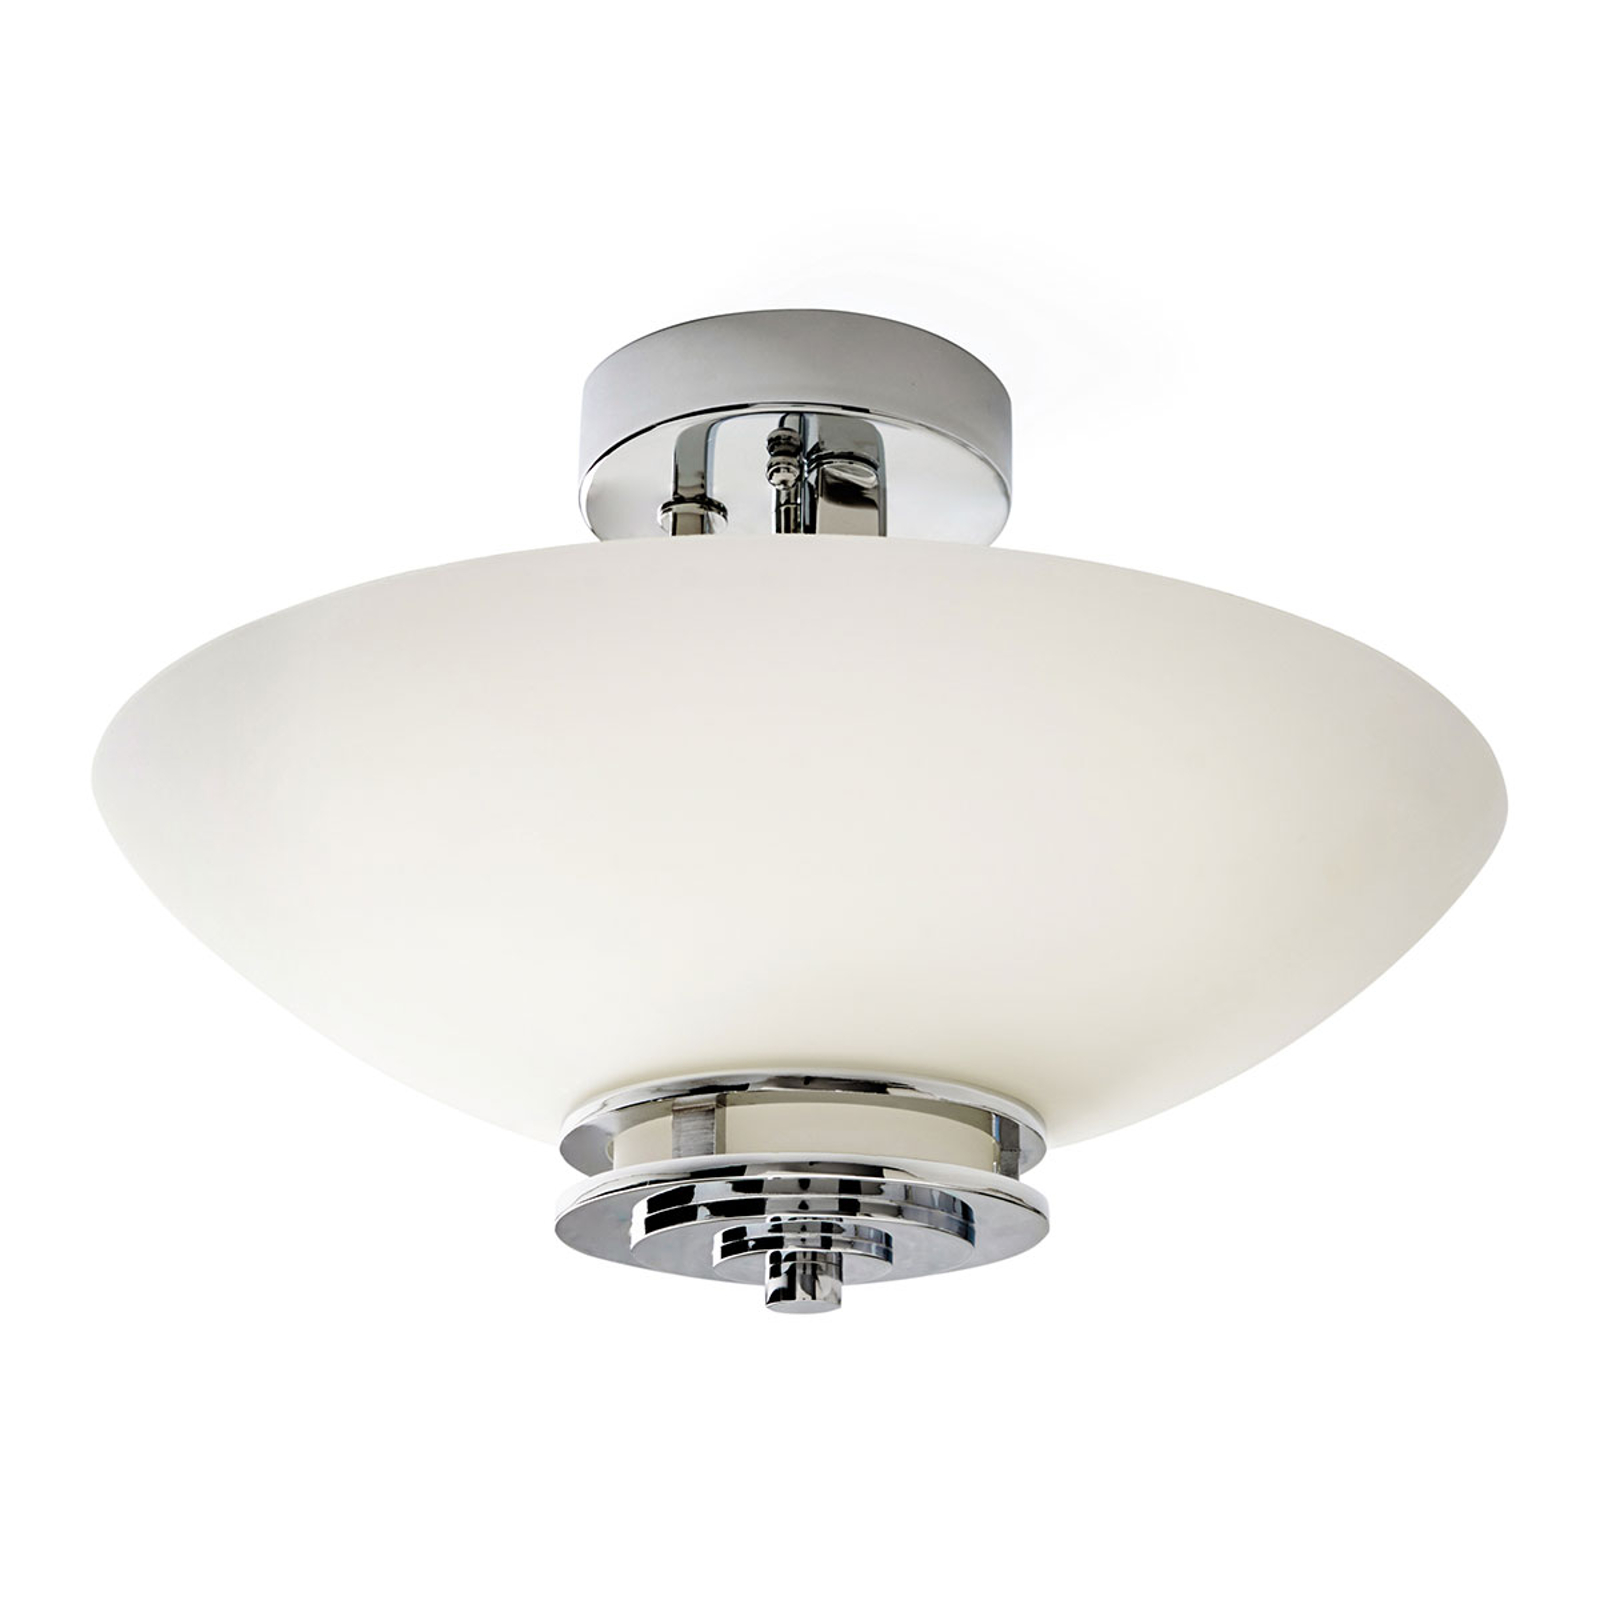 Łazienkowa lampa sufitowa Hendrik z LED